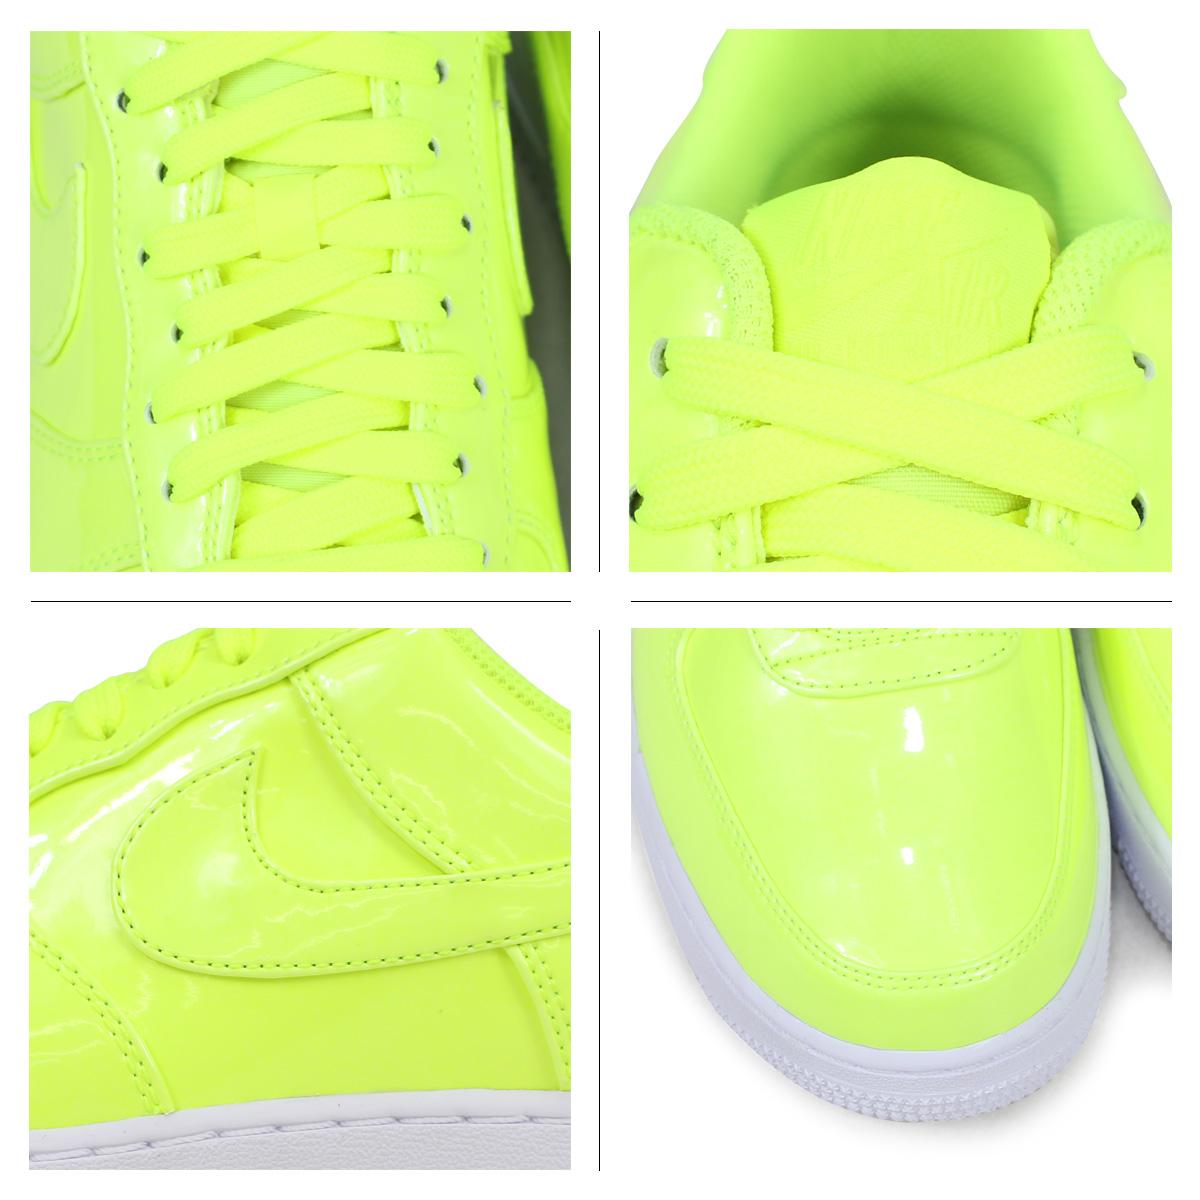 discount ded9a 753fe ... NIKE AIR FORCE 1 UV Nike air force 1 07 LV8 sneakers men gap Dis AJ9505  ...